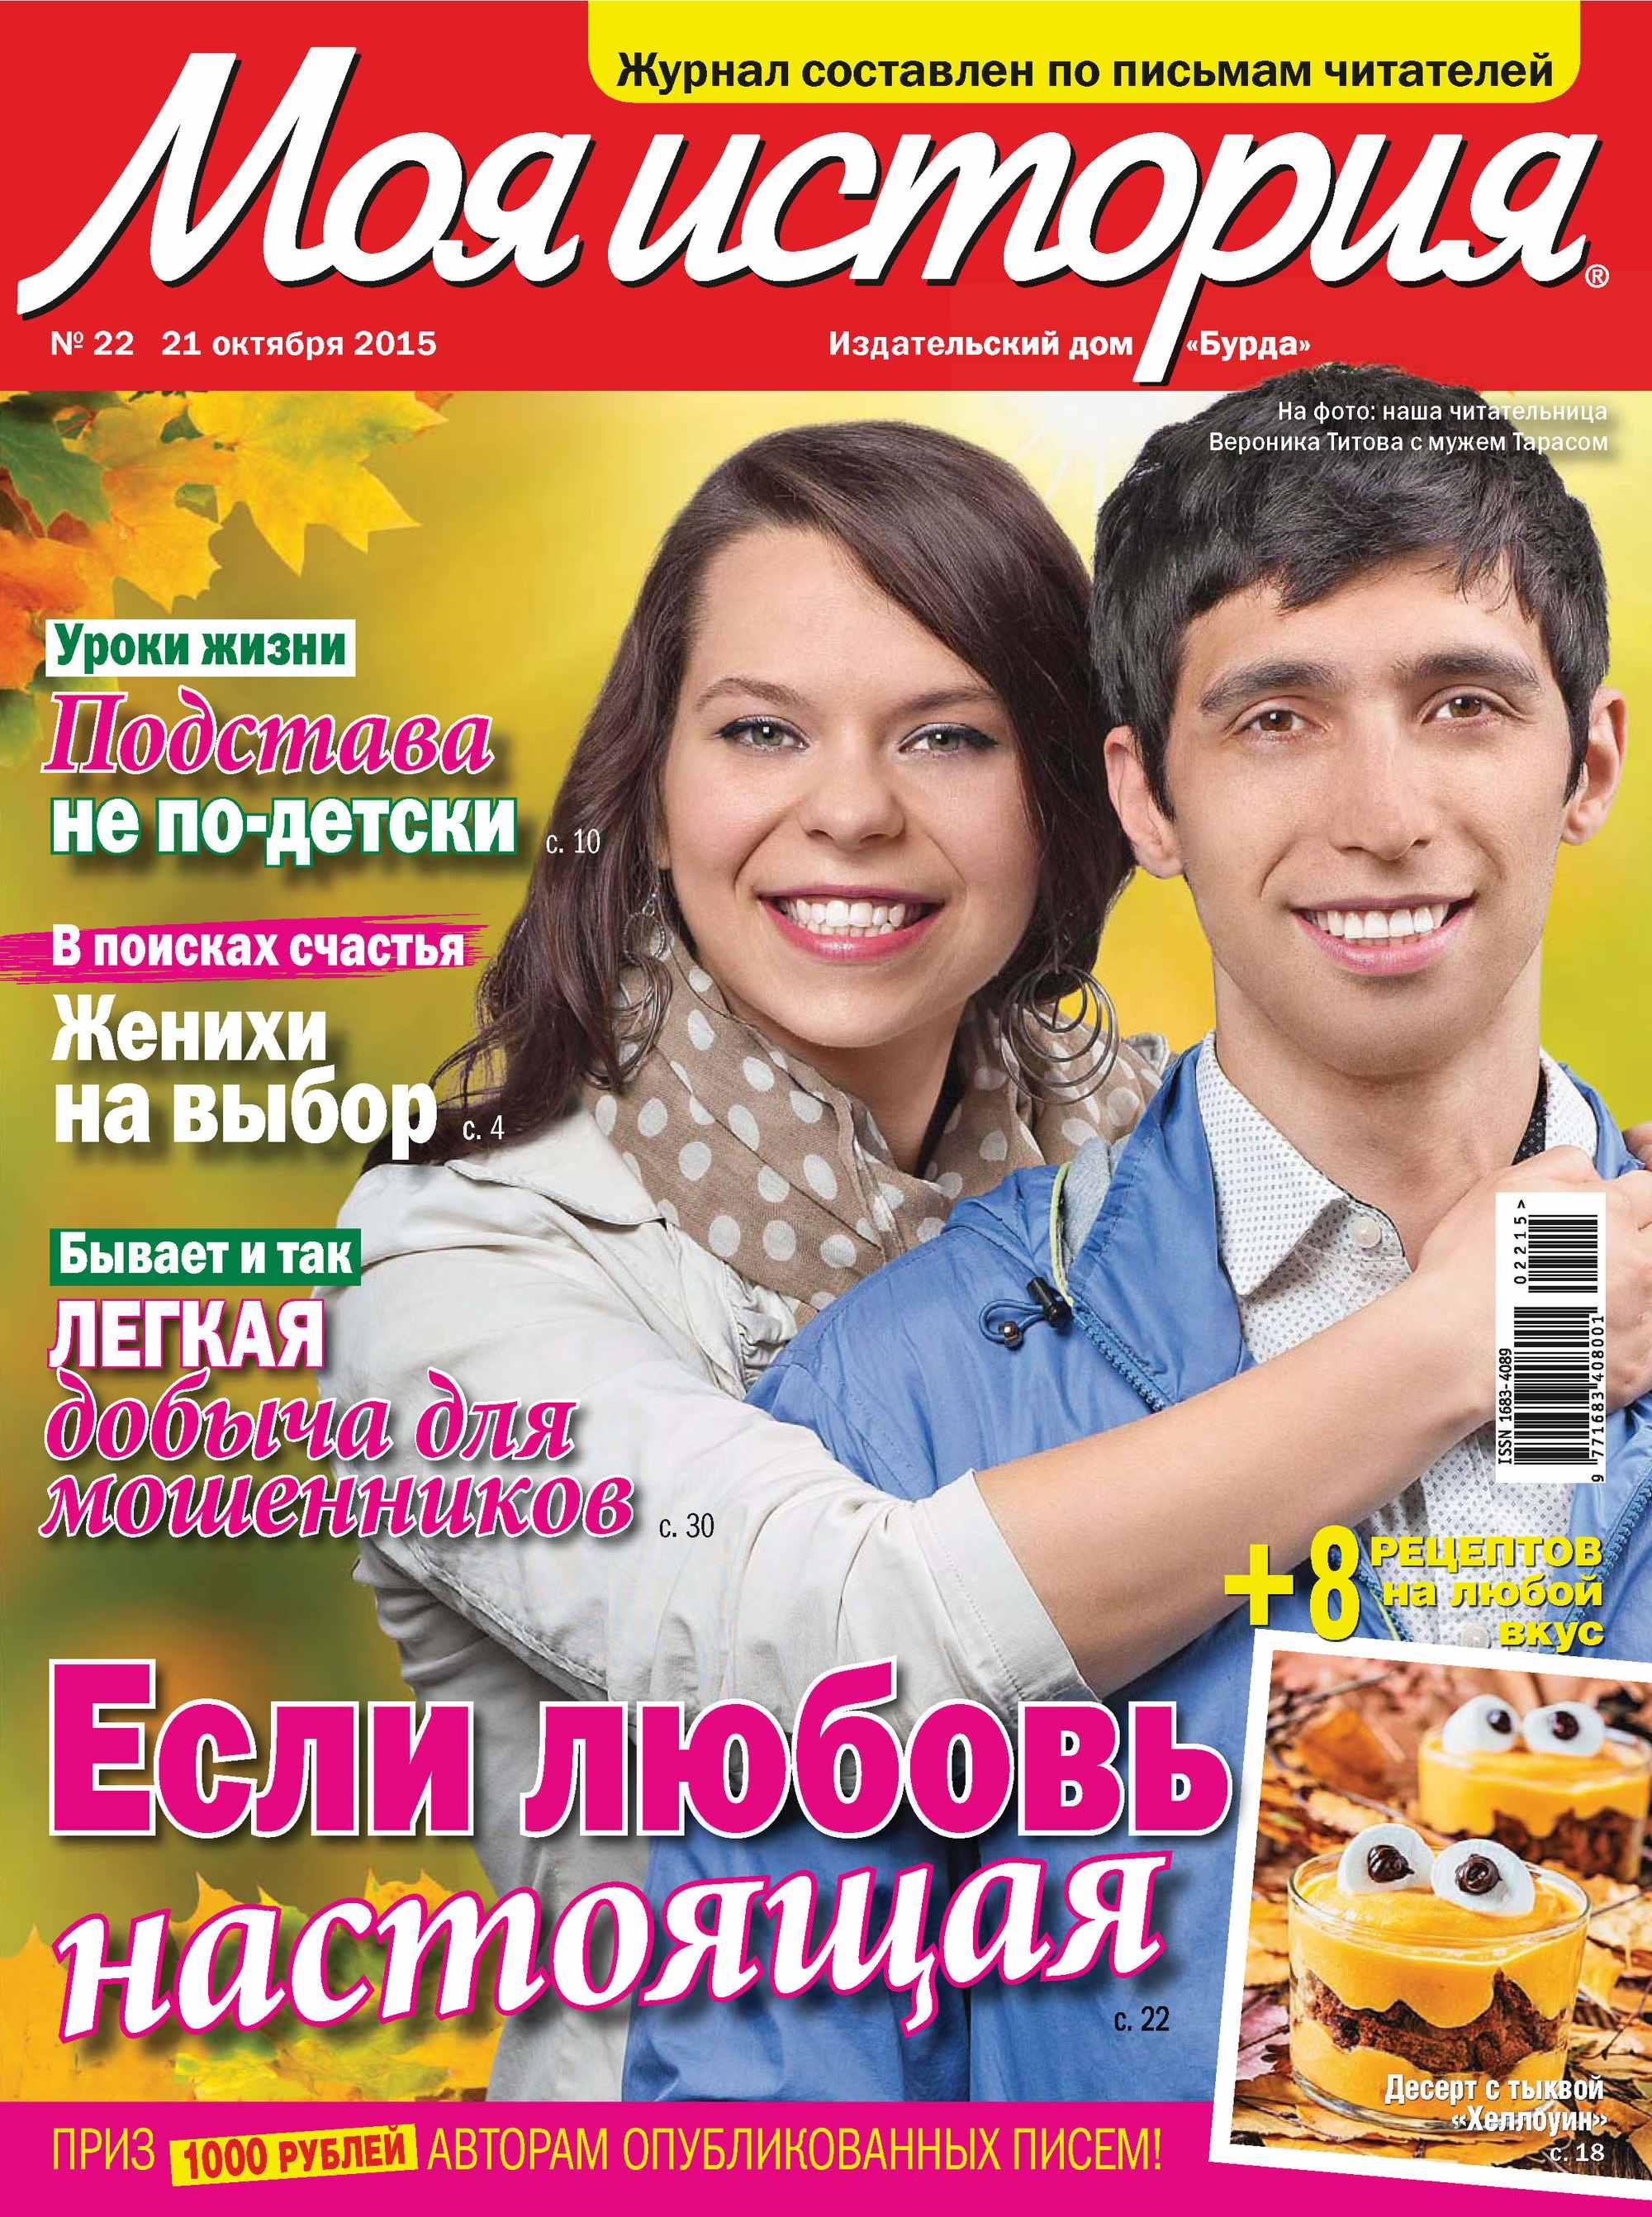 ИД «Бурда» Журнал «Моя история» №22/2015 ид бурда журнал моя история 23 2015